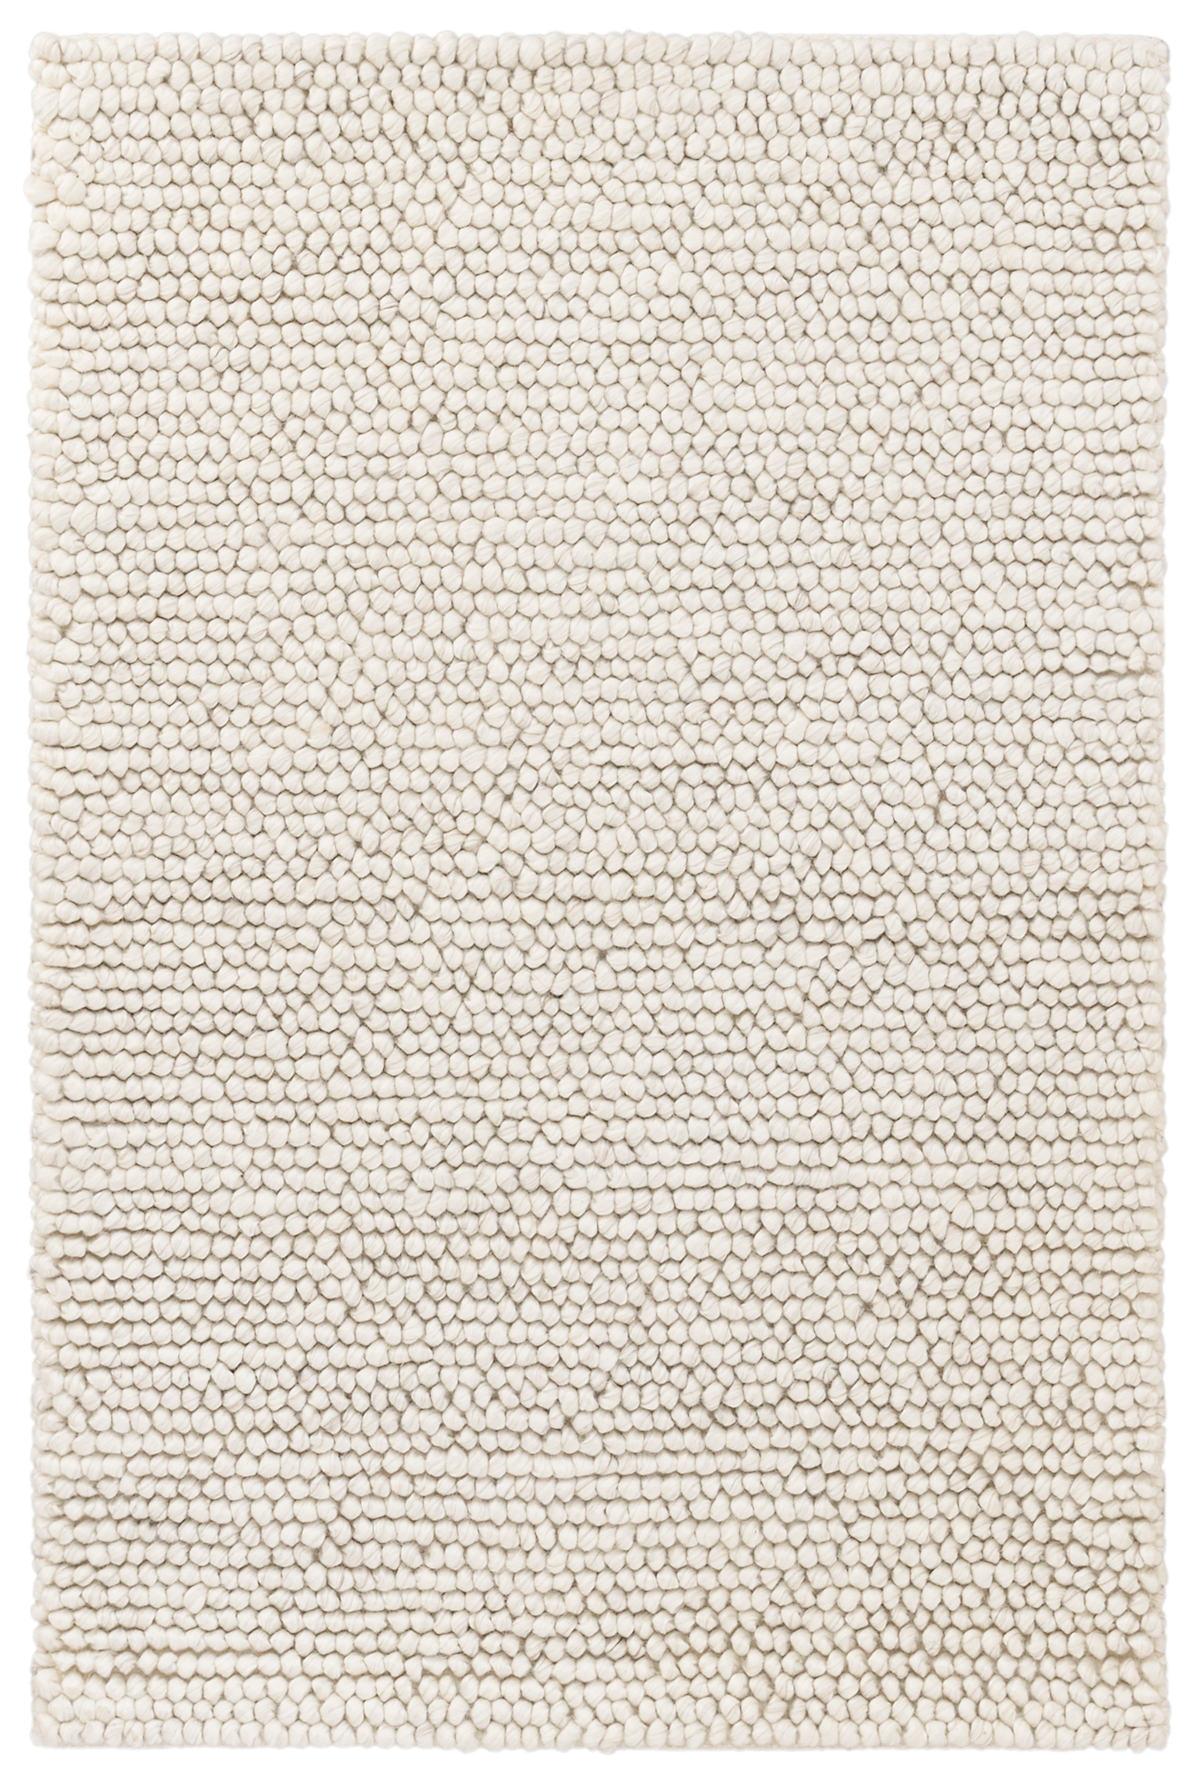 Niels Ivory Woven Wool/Viscose Rug